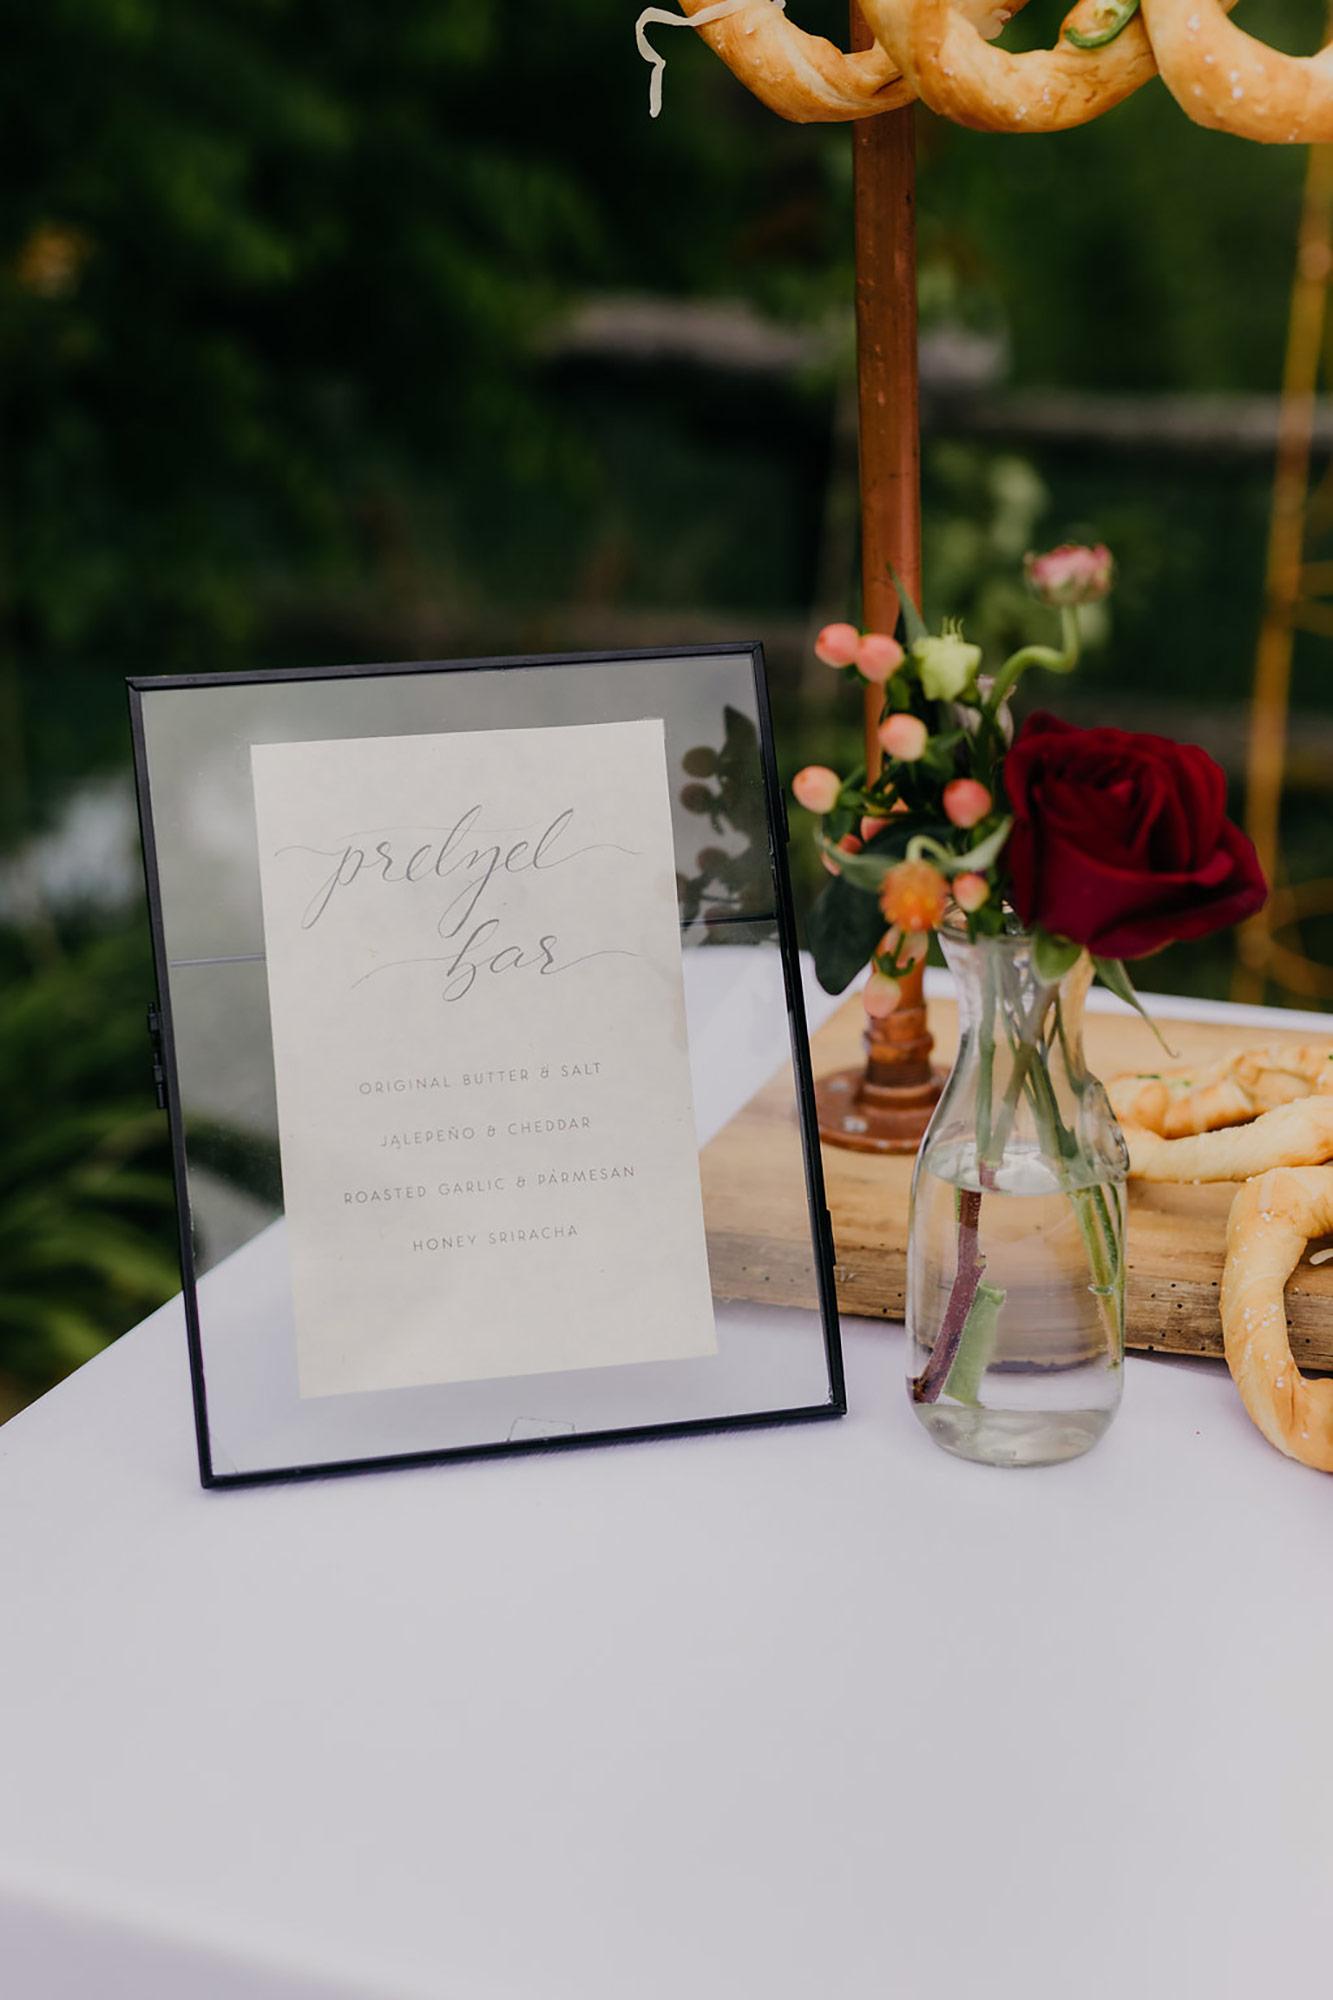 Kurtz-Orchards-Wedding-Niagara-wedding-Vineyard-Bride-Photography-by-Kayla-Rocca-025.JPG